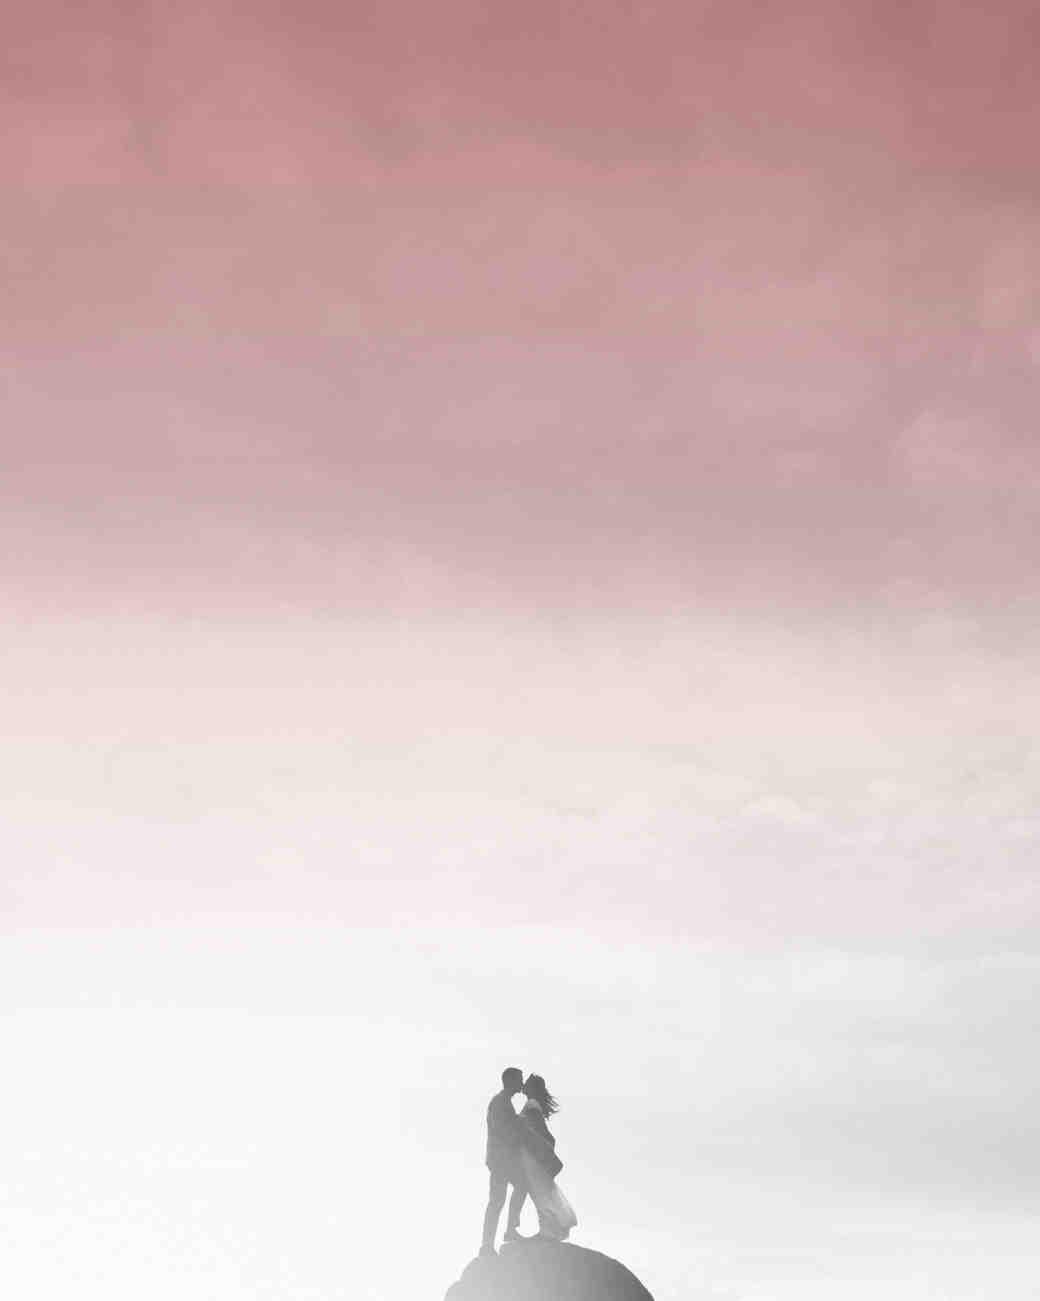 christen-billy-wedding-couple-178-011-s111597-1014.jpg